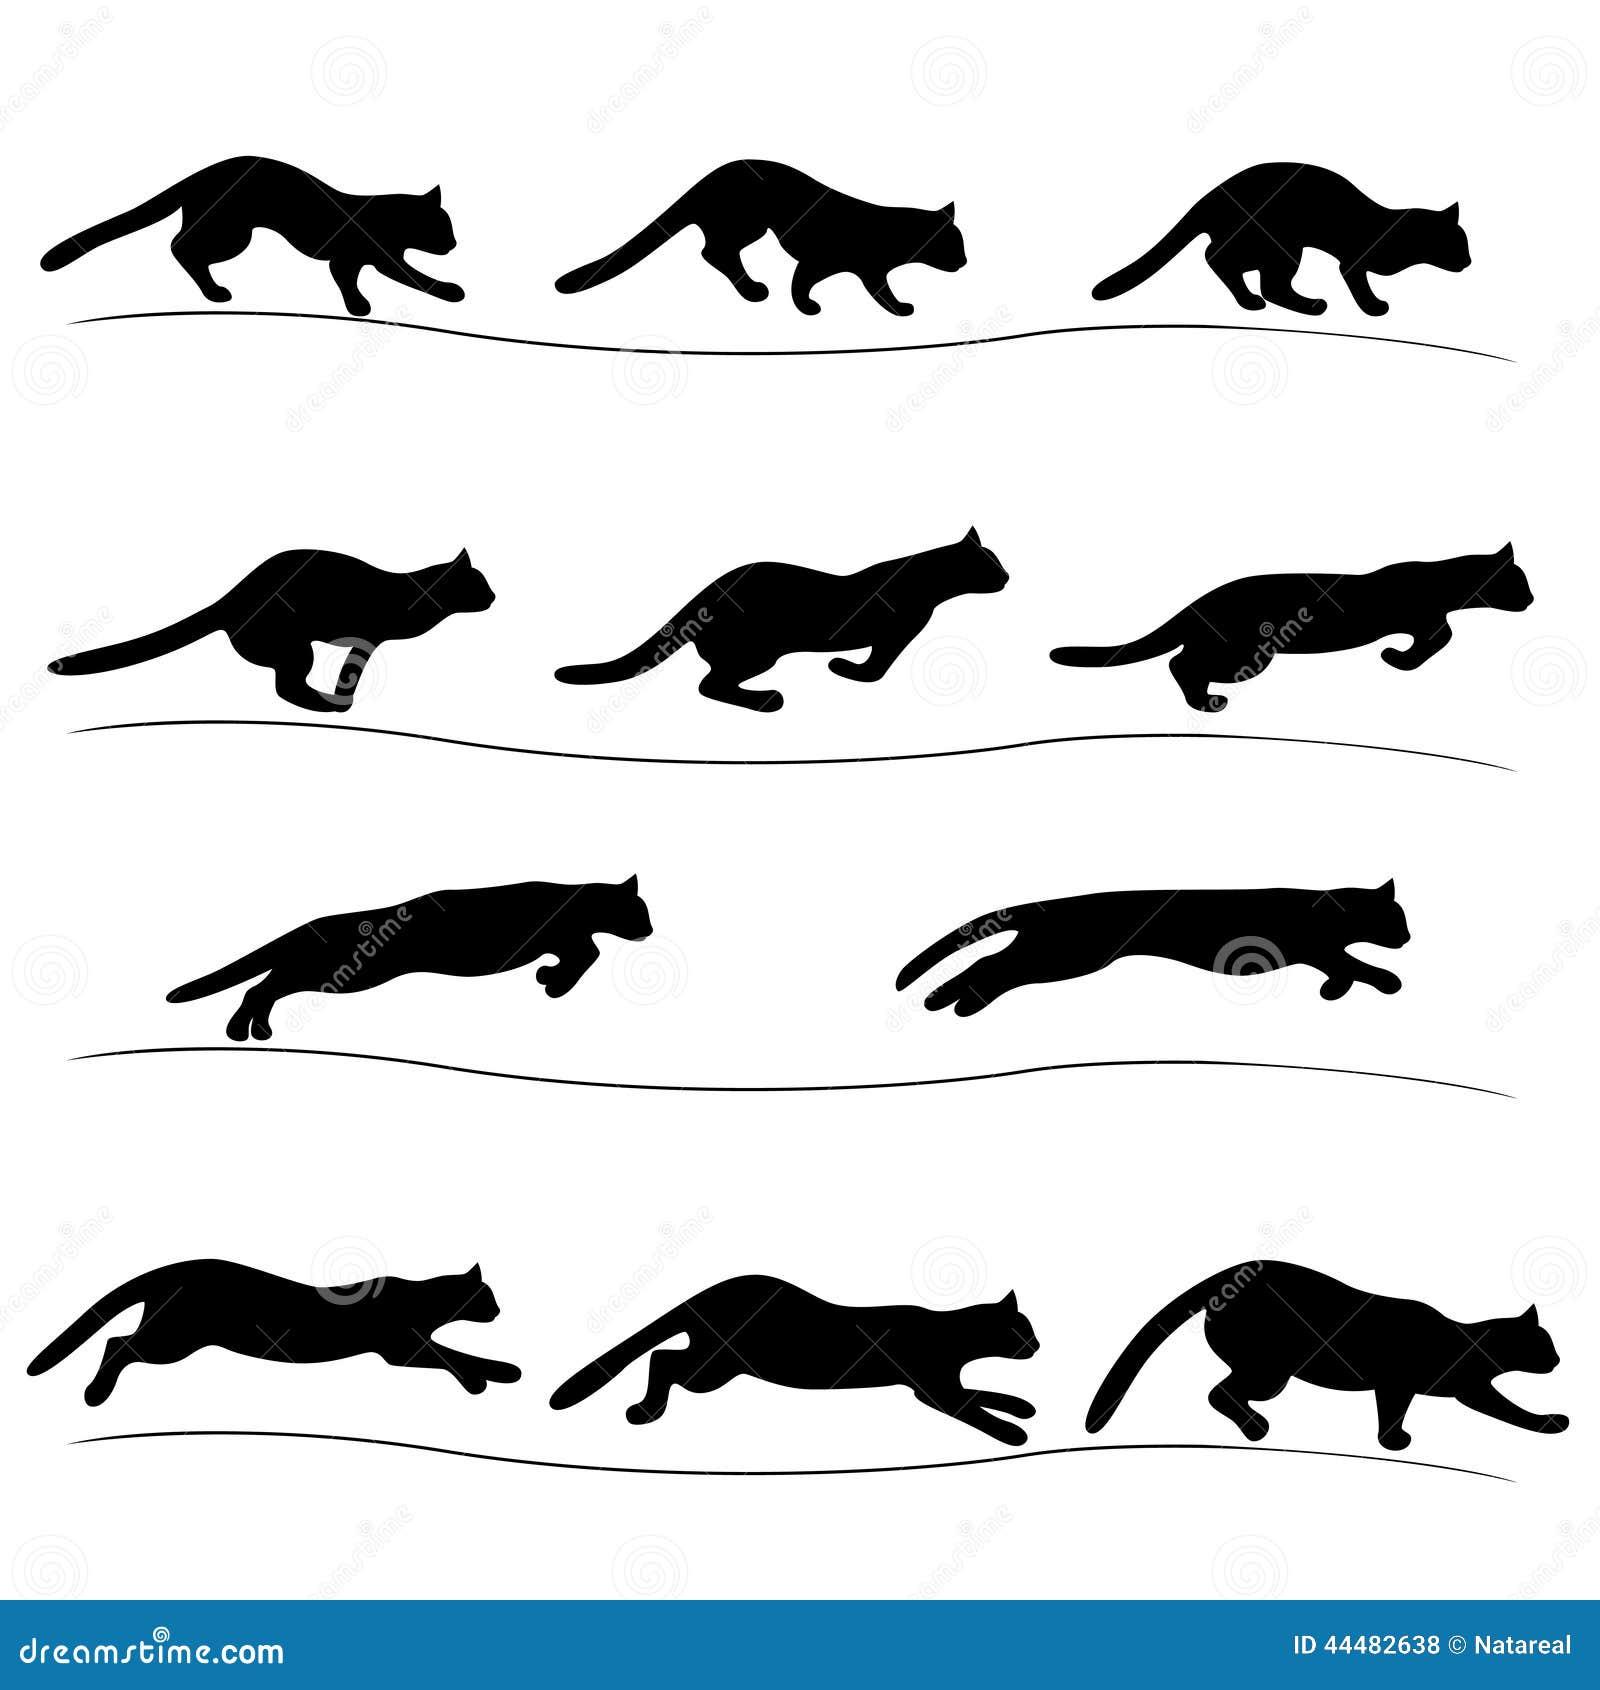 silueta de gato negro - photo #23